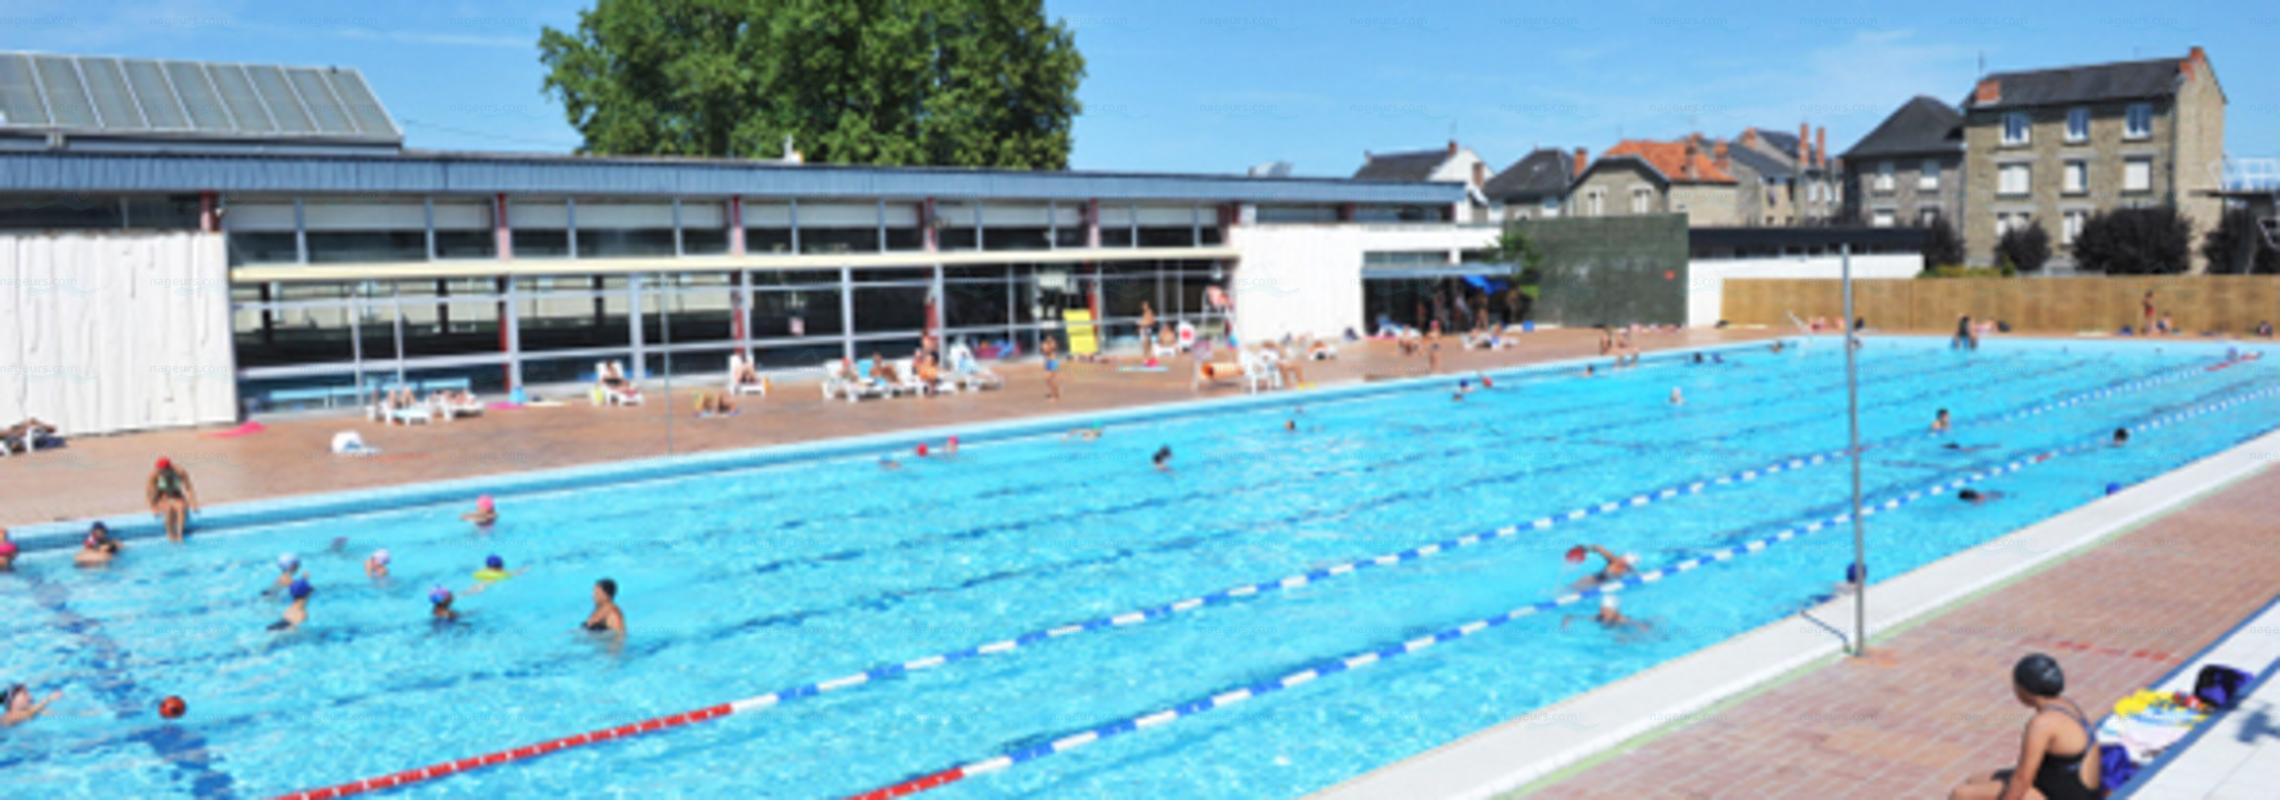 Photos piscine de brive la gaillarde for Horaire de la piscine